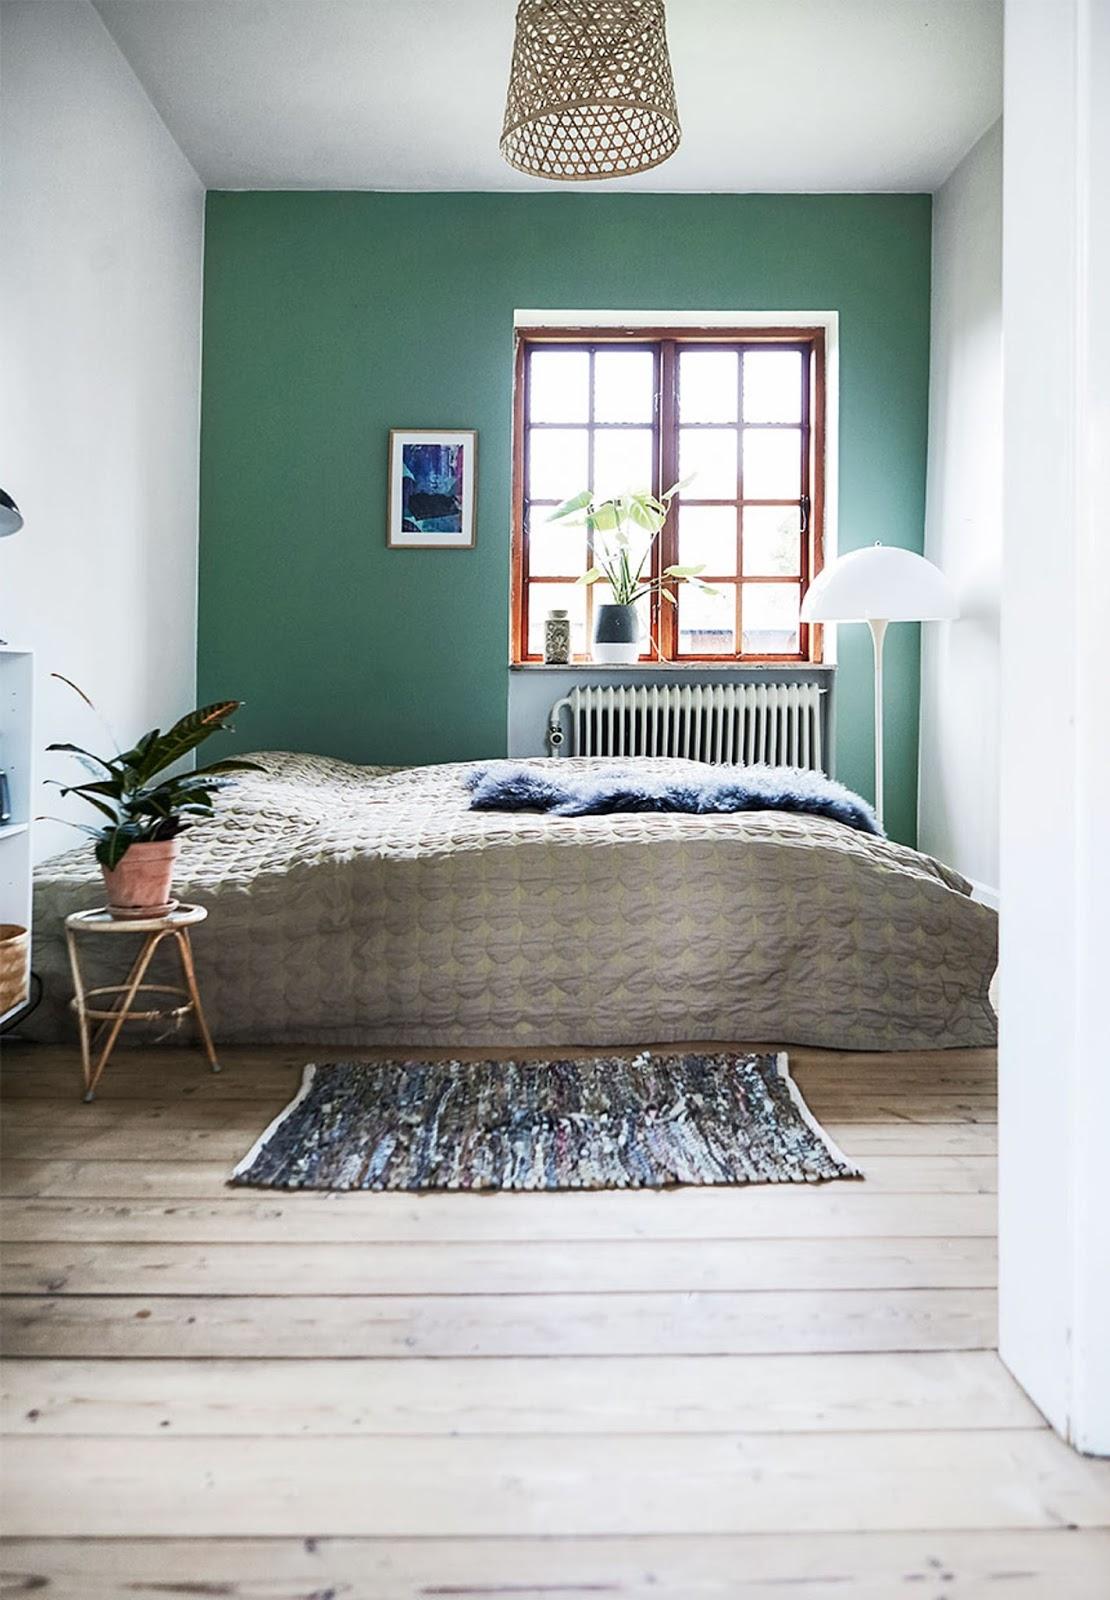 bedroom, green wall, scandinavian interior, carpet, nordic design, home decor